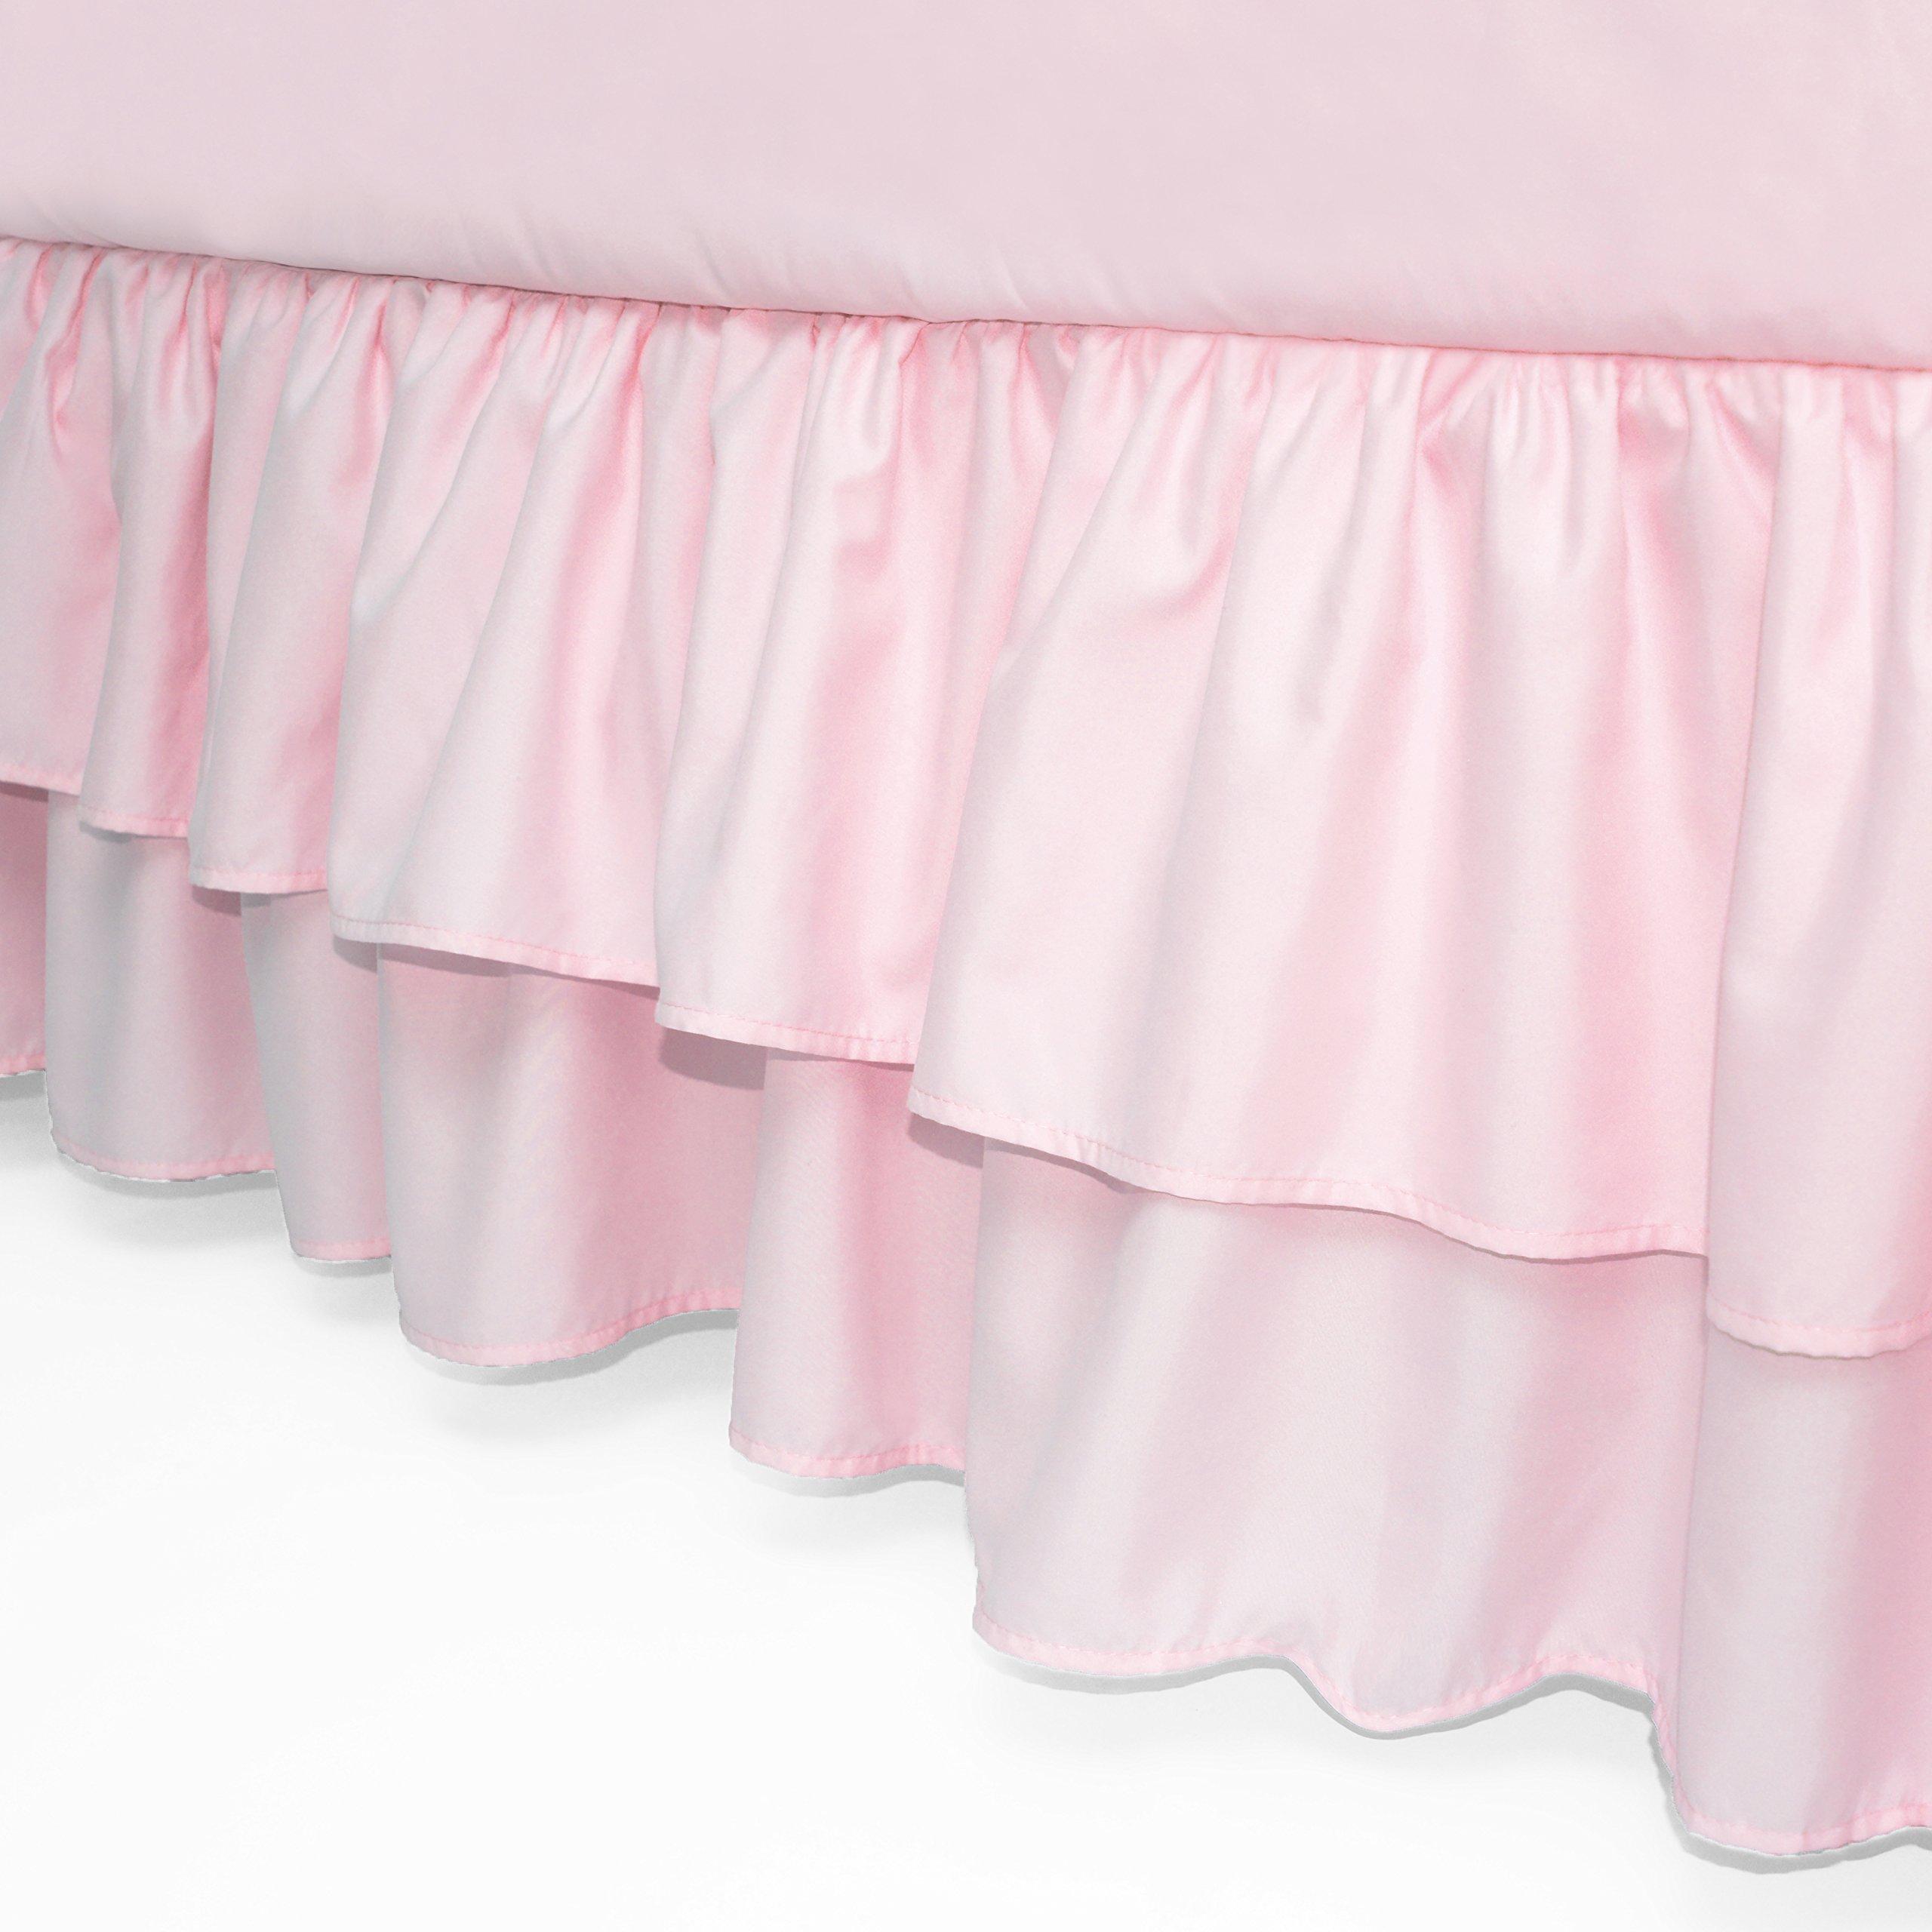 American Baby Company Double Layer Ruffled Crib Skirt, Pink